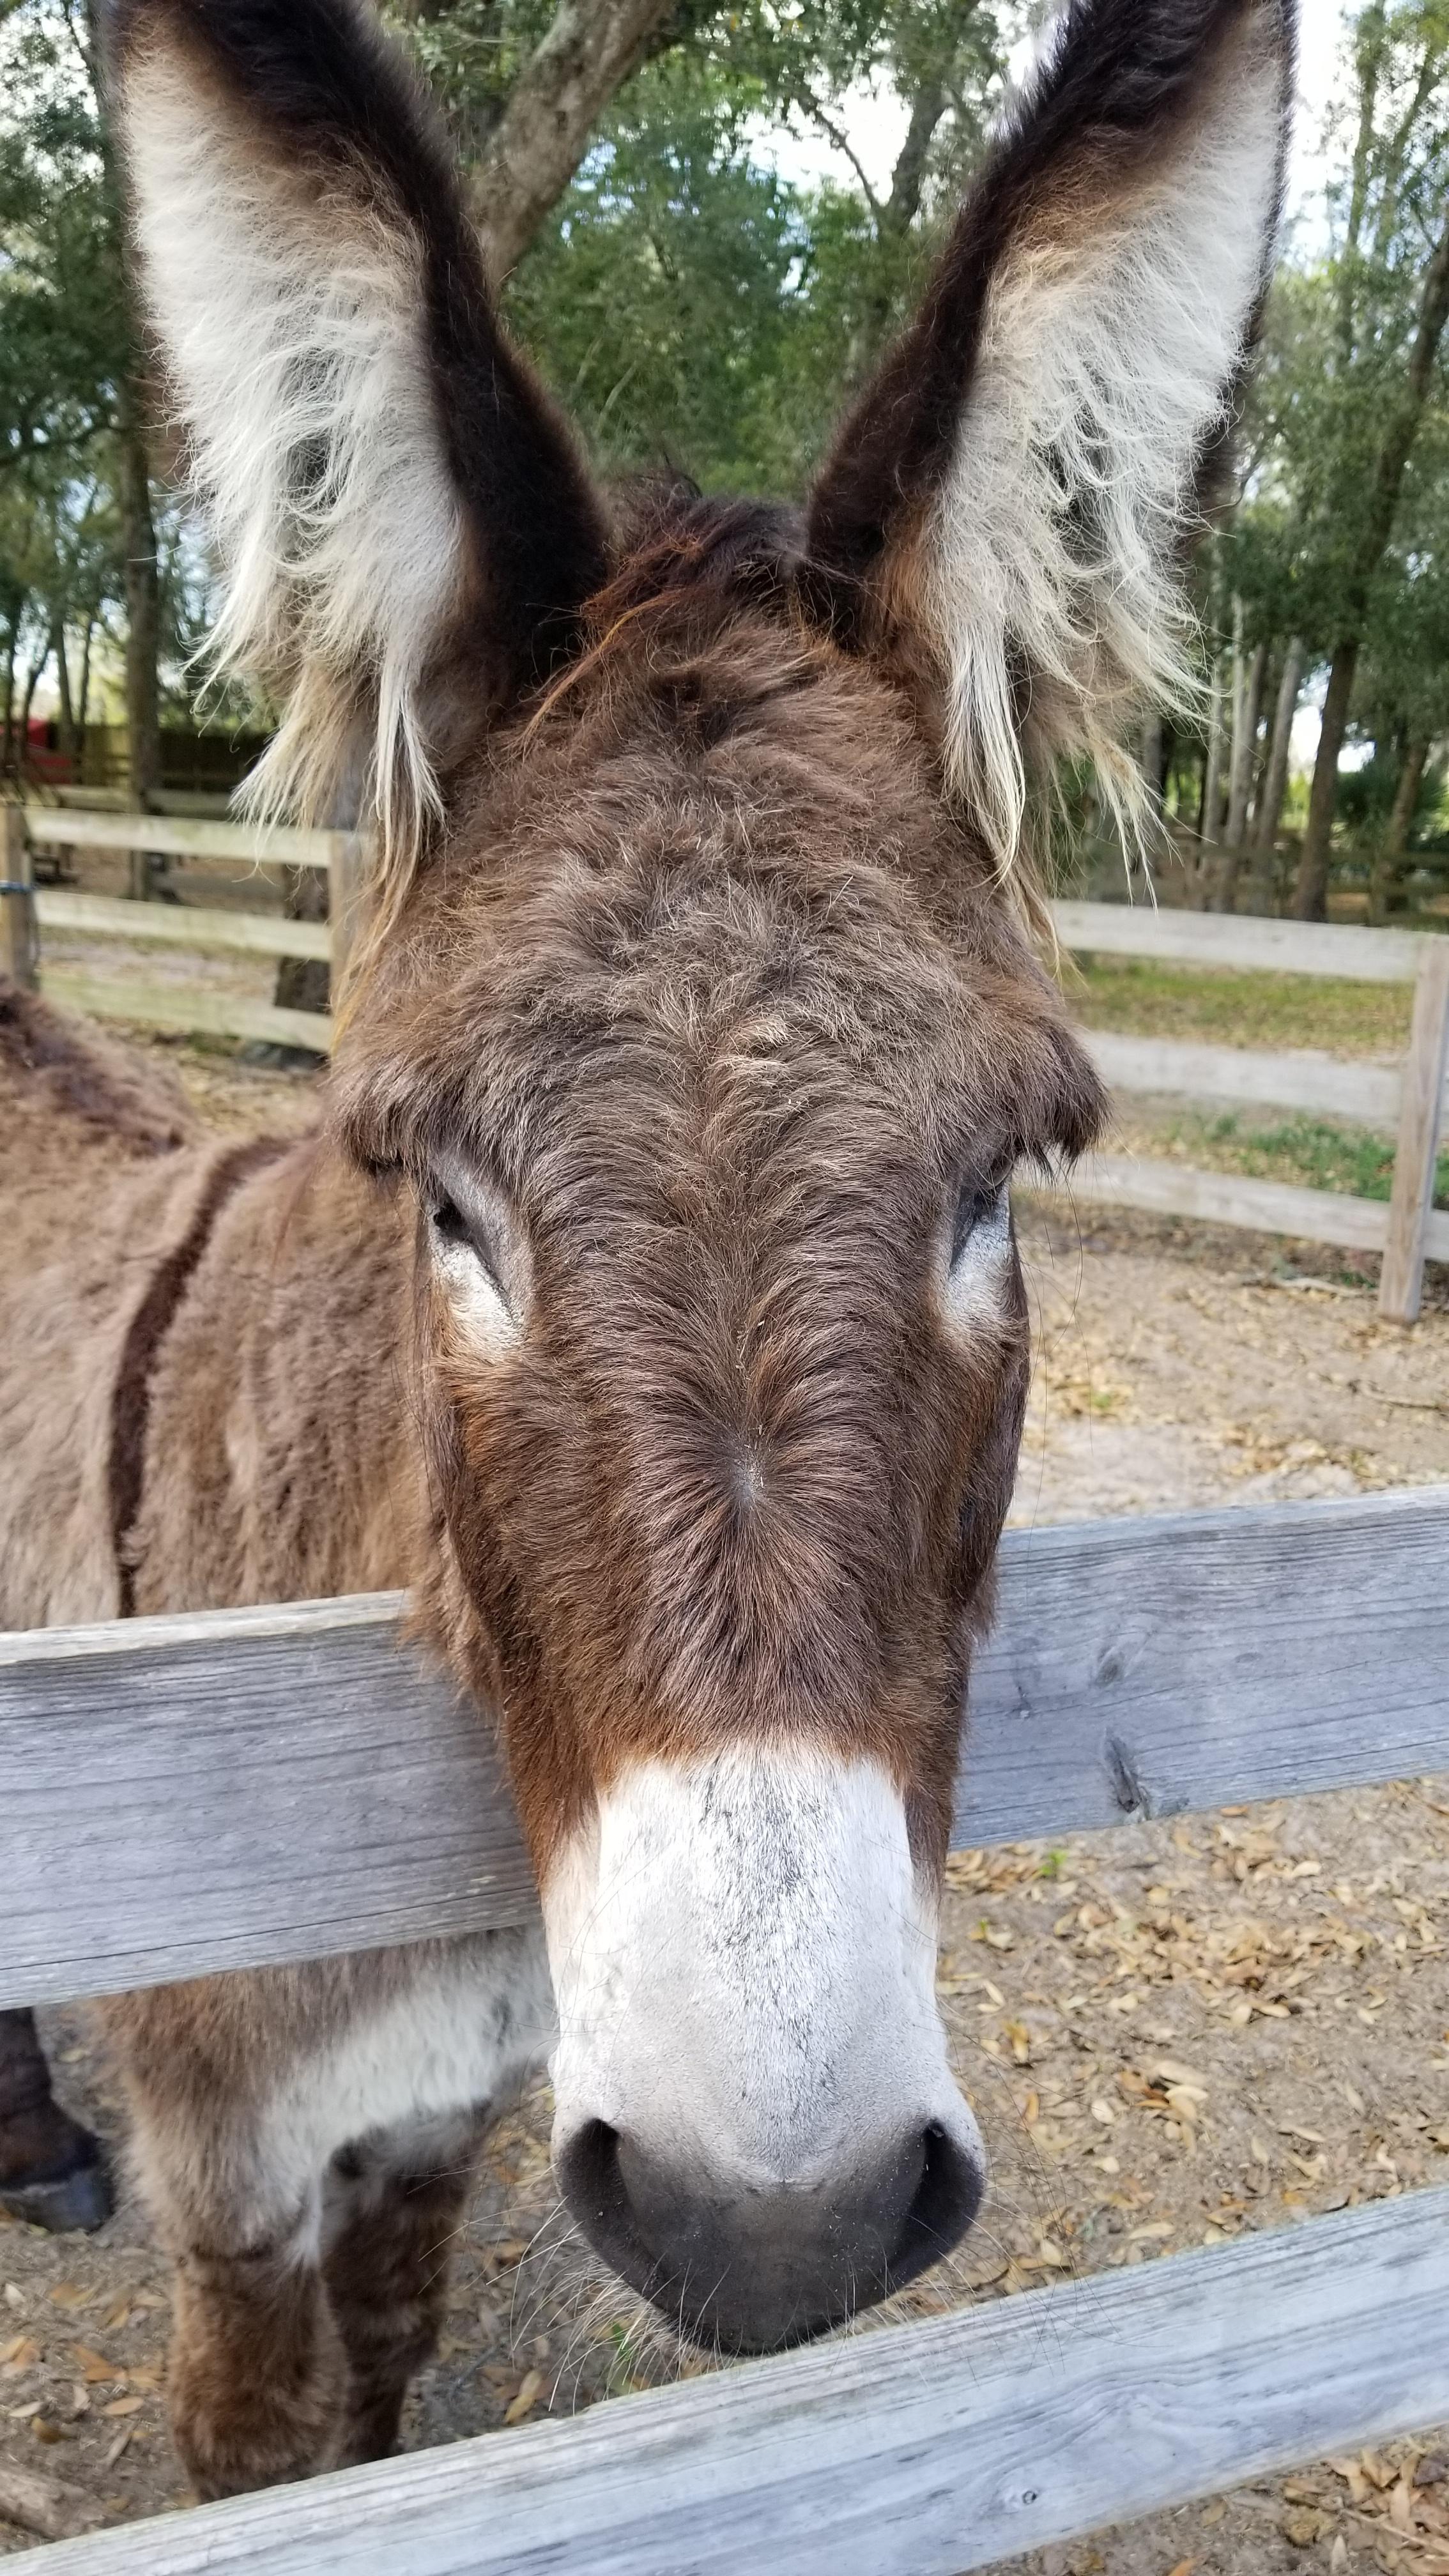 This burro enjoys living at Santa's Christmas Tree Farm in Eustis, Florida.